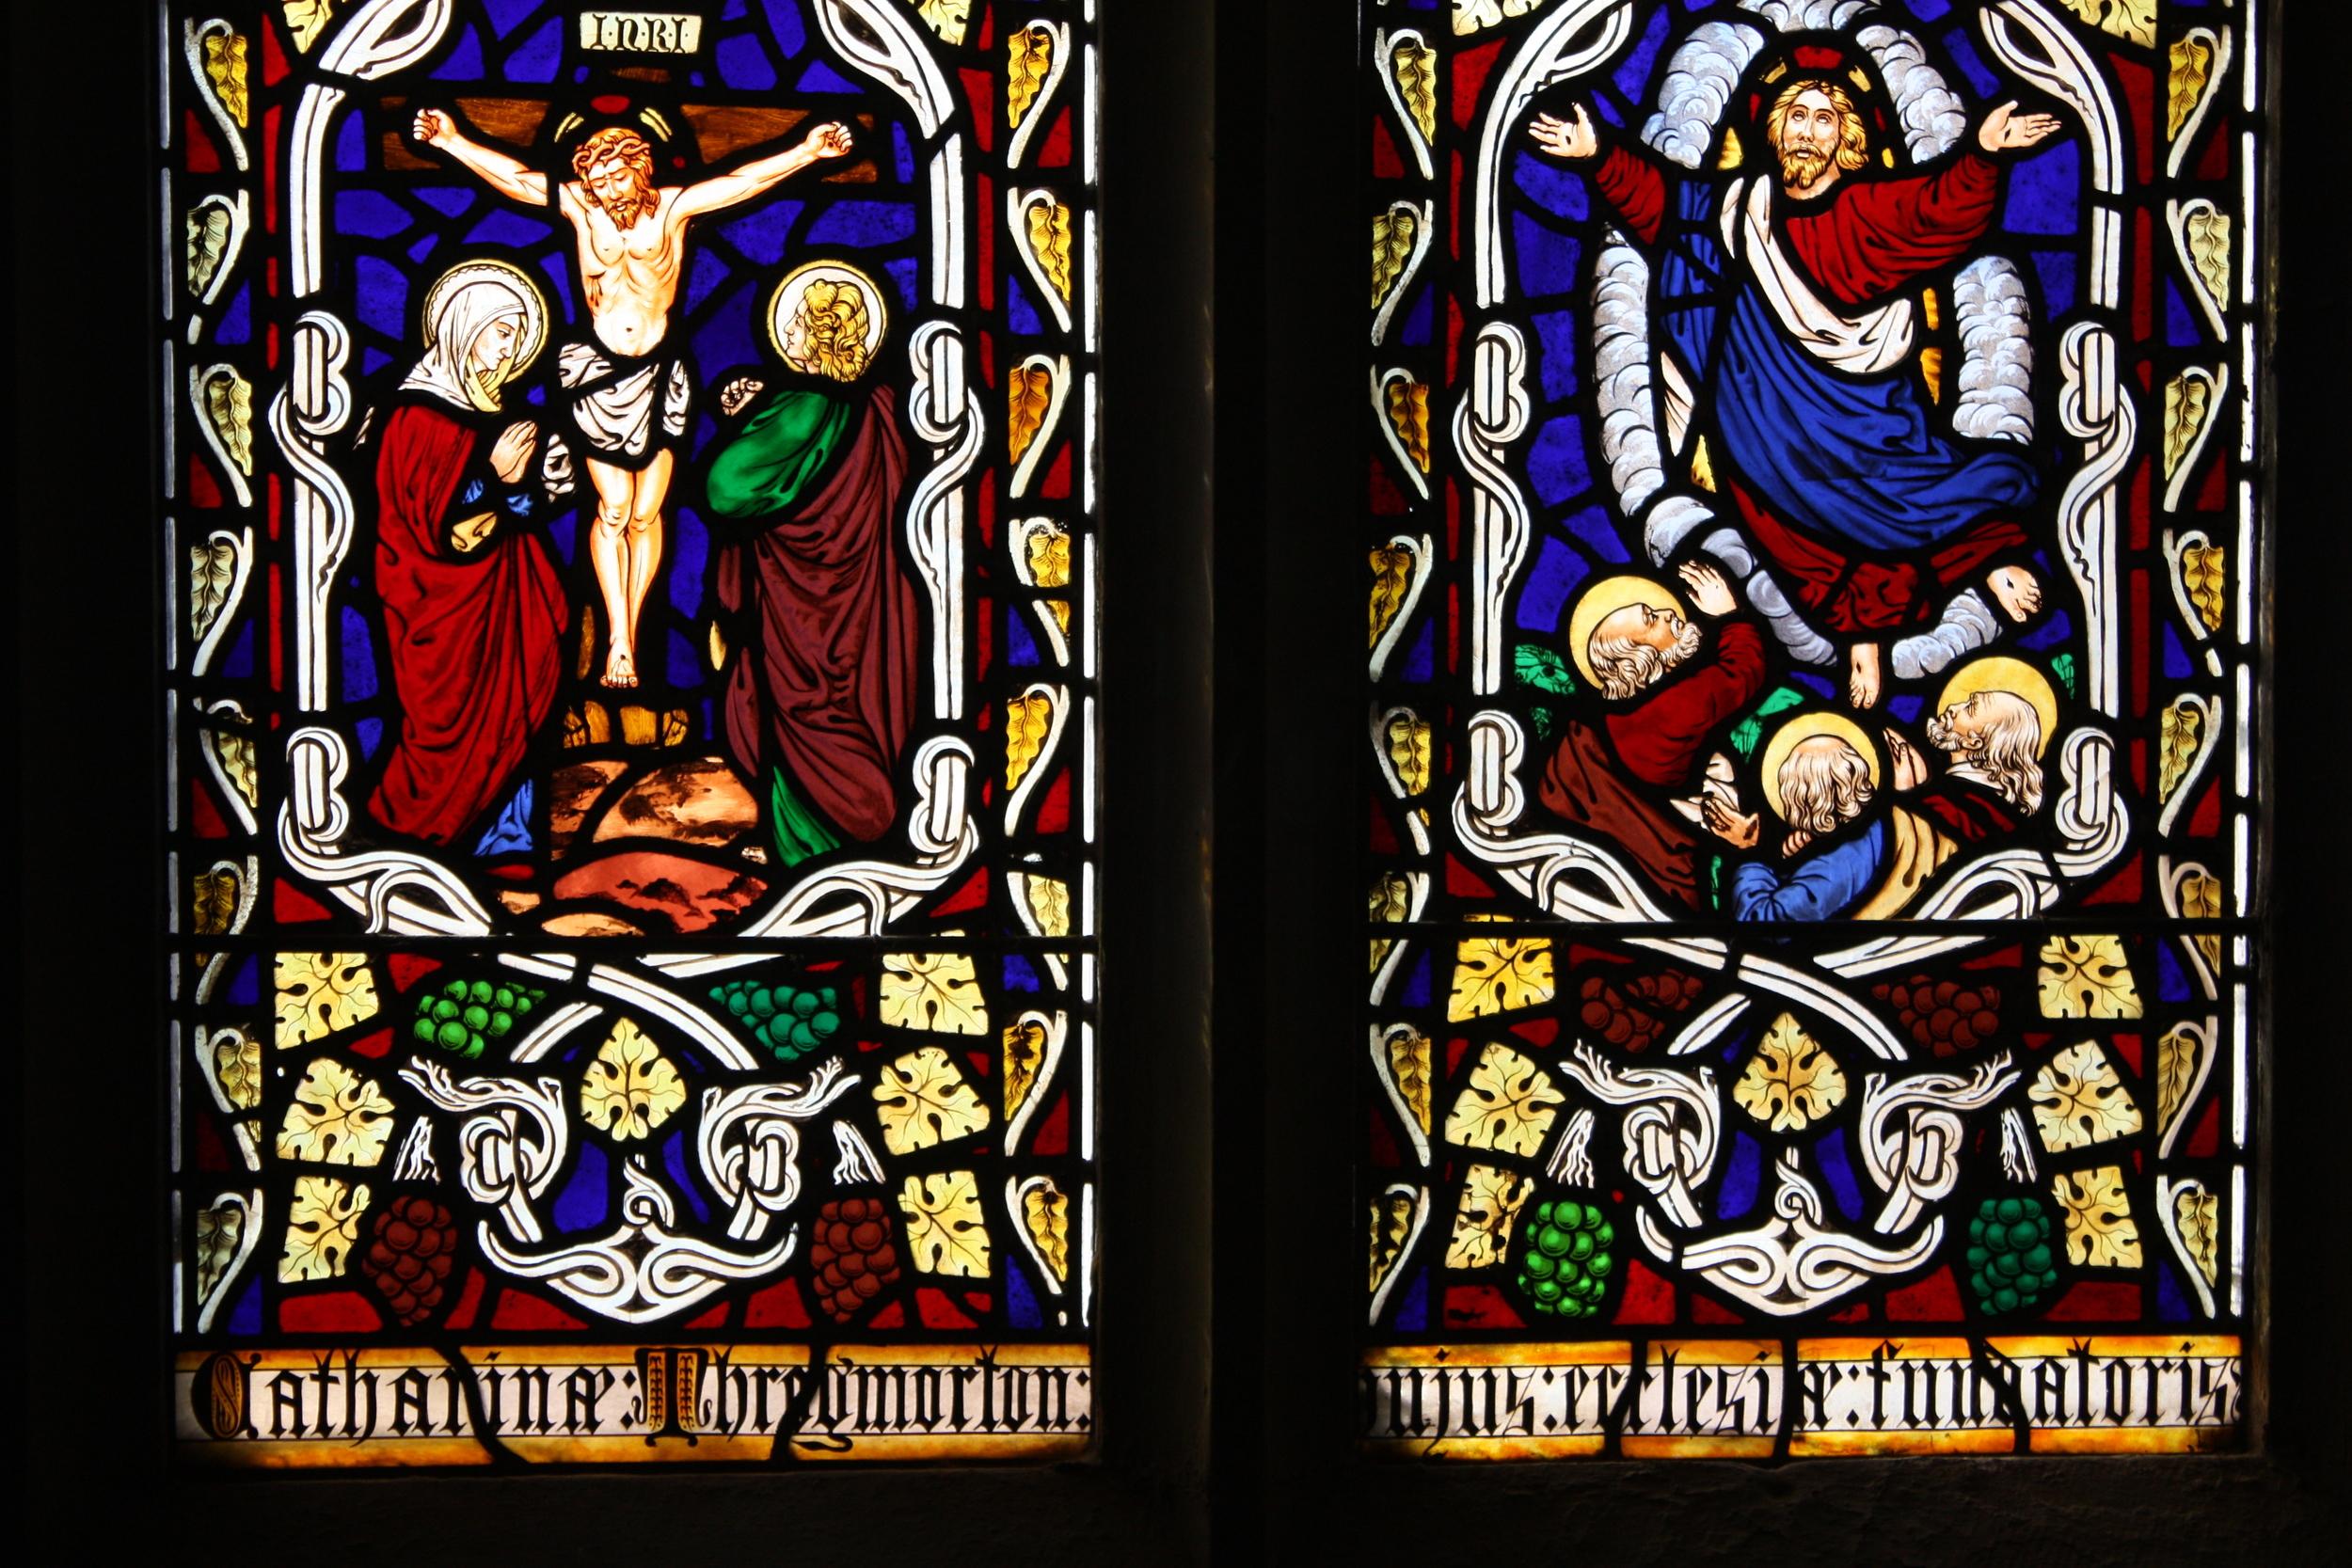 Throckmorton window 100225 j.JPG